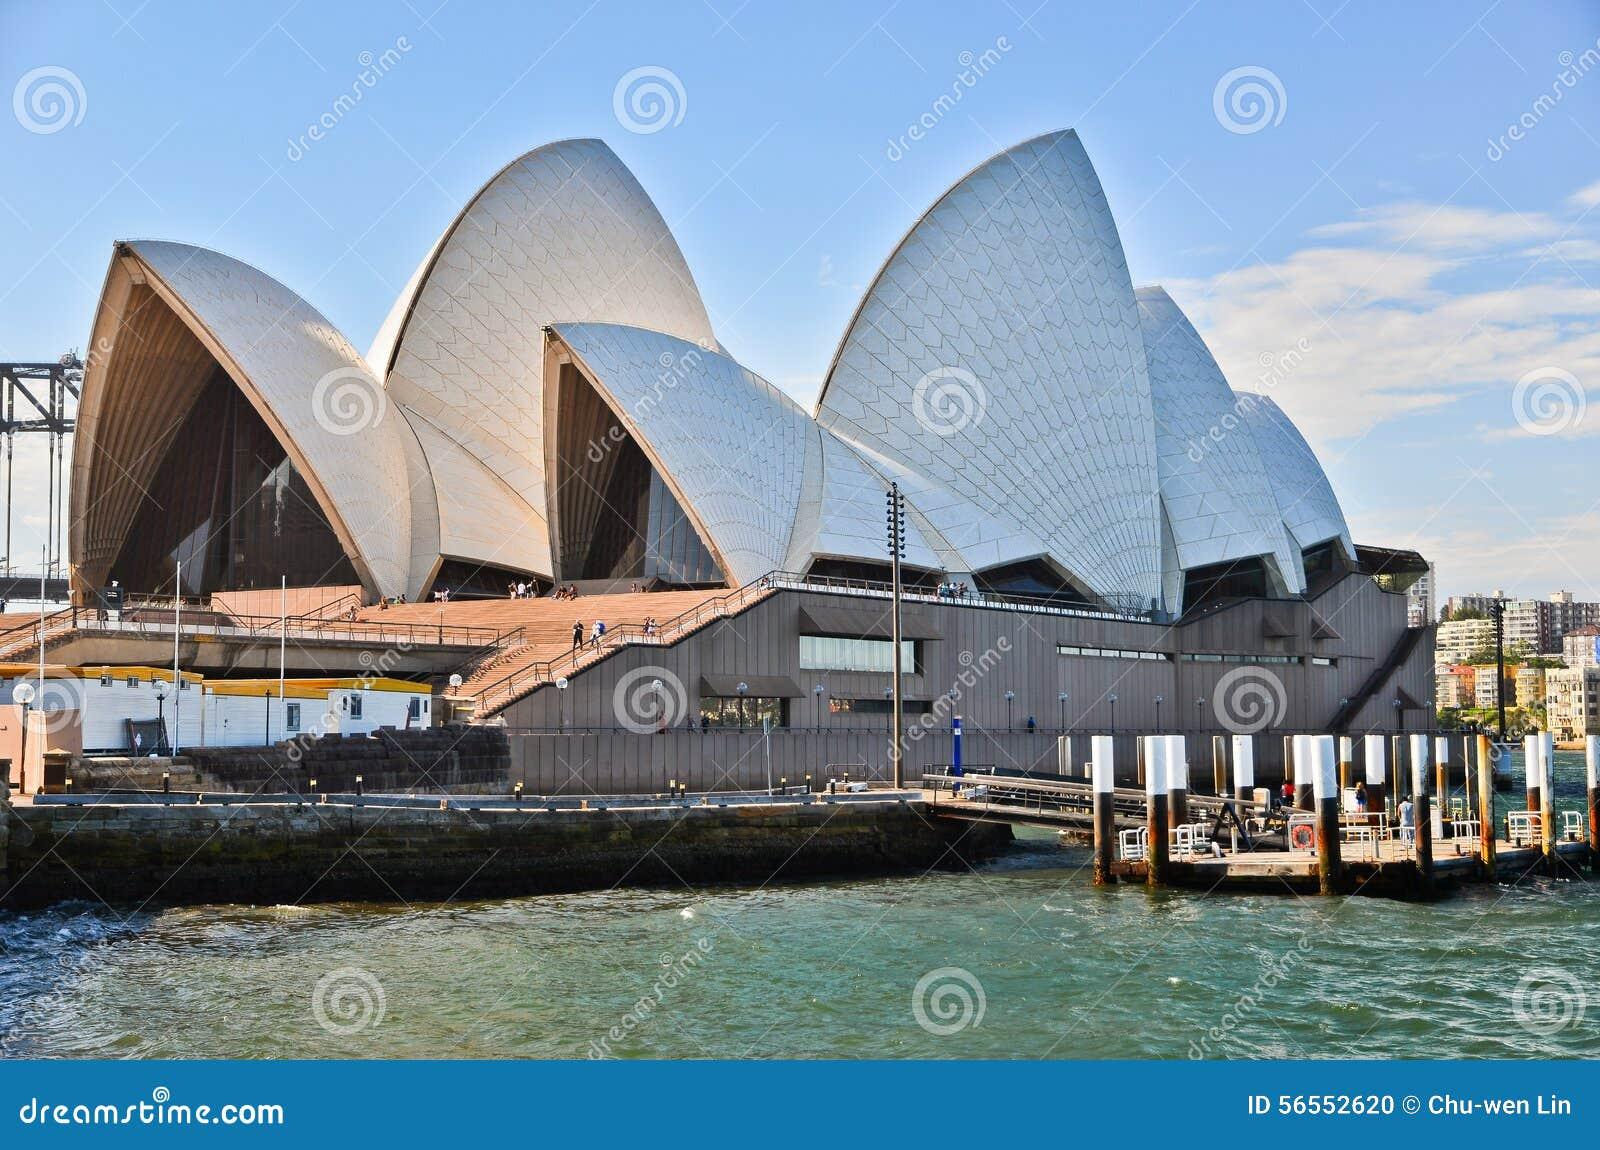 Download Άποψη της Όπερας του Σίδνεϊ Εκδοτική εικόνα - εικόνα από πόλη, μητρόπολη: 56552620